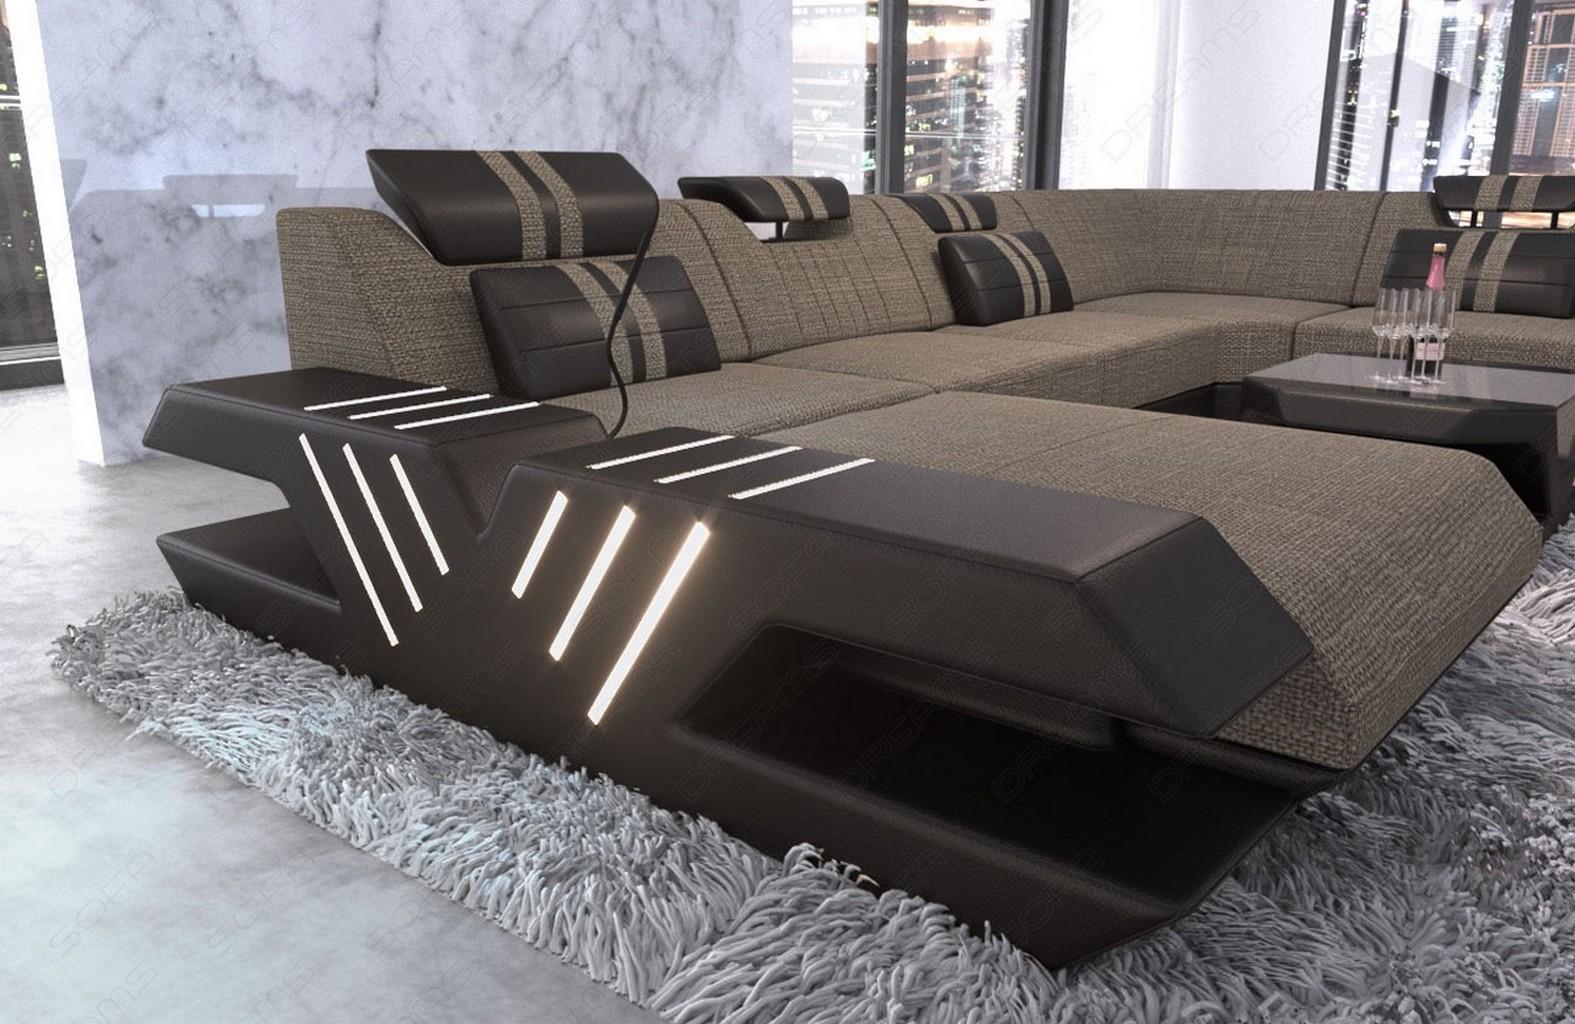 stoff wohnlandschaft polstersofa luxus mega couch venedig xxl ottomane led usb ebay. Black Bedroom Furniture Sets. Home Design Ideas